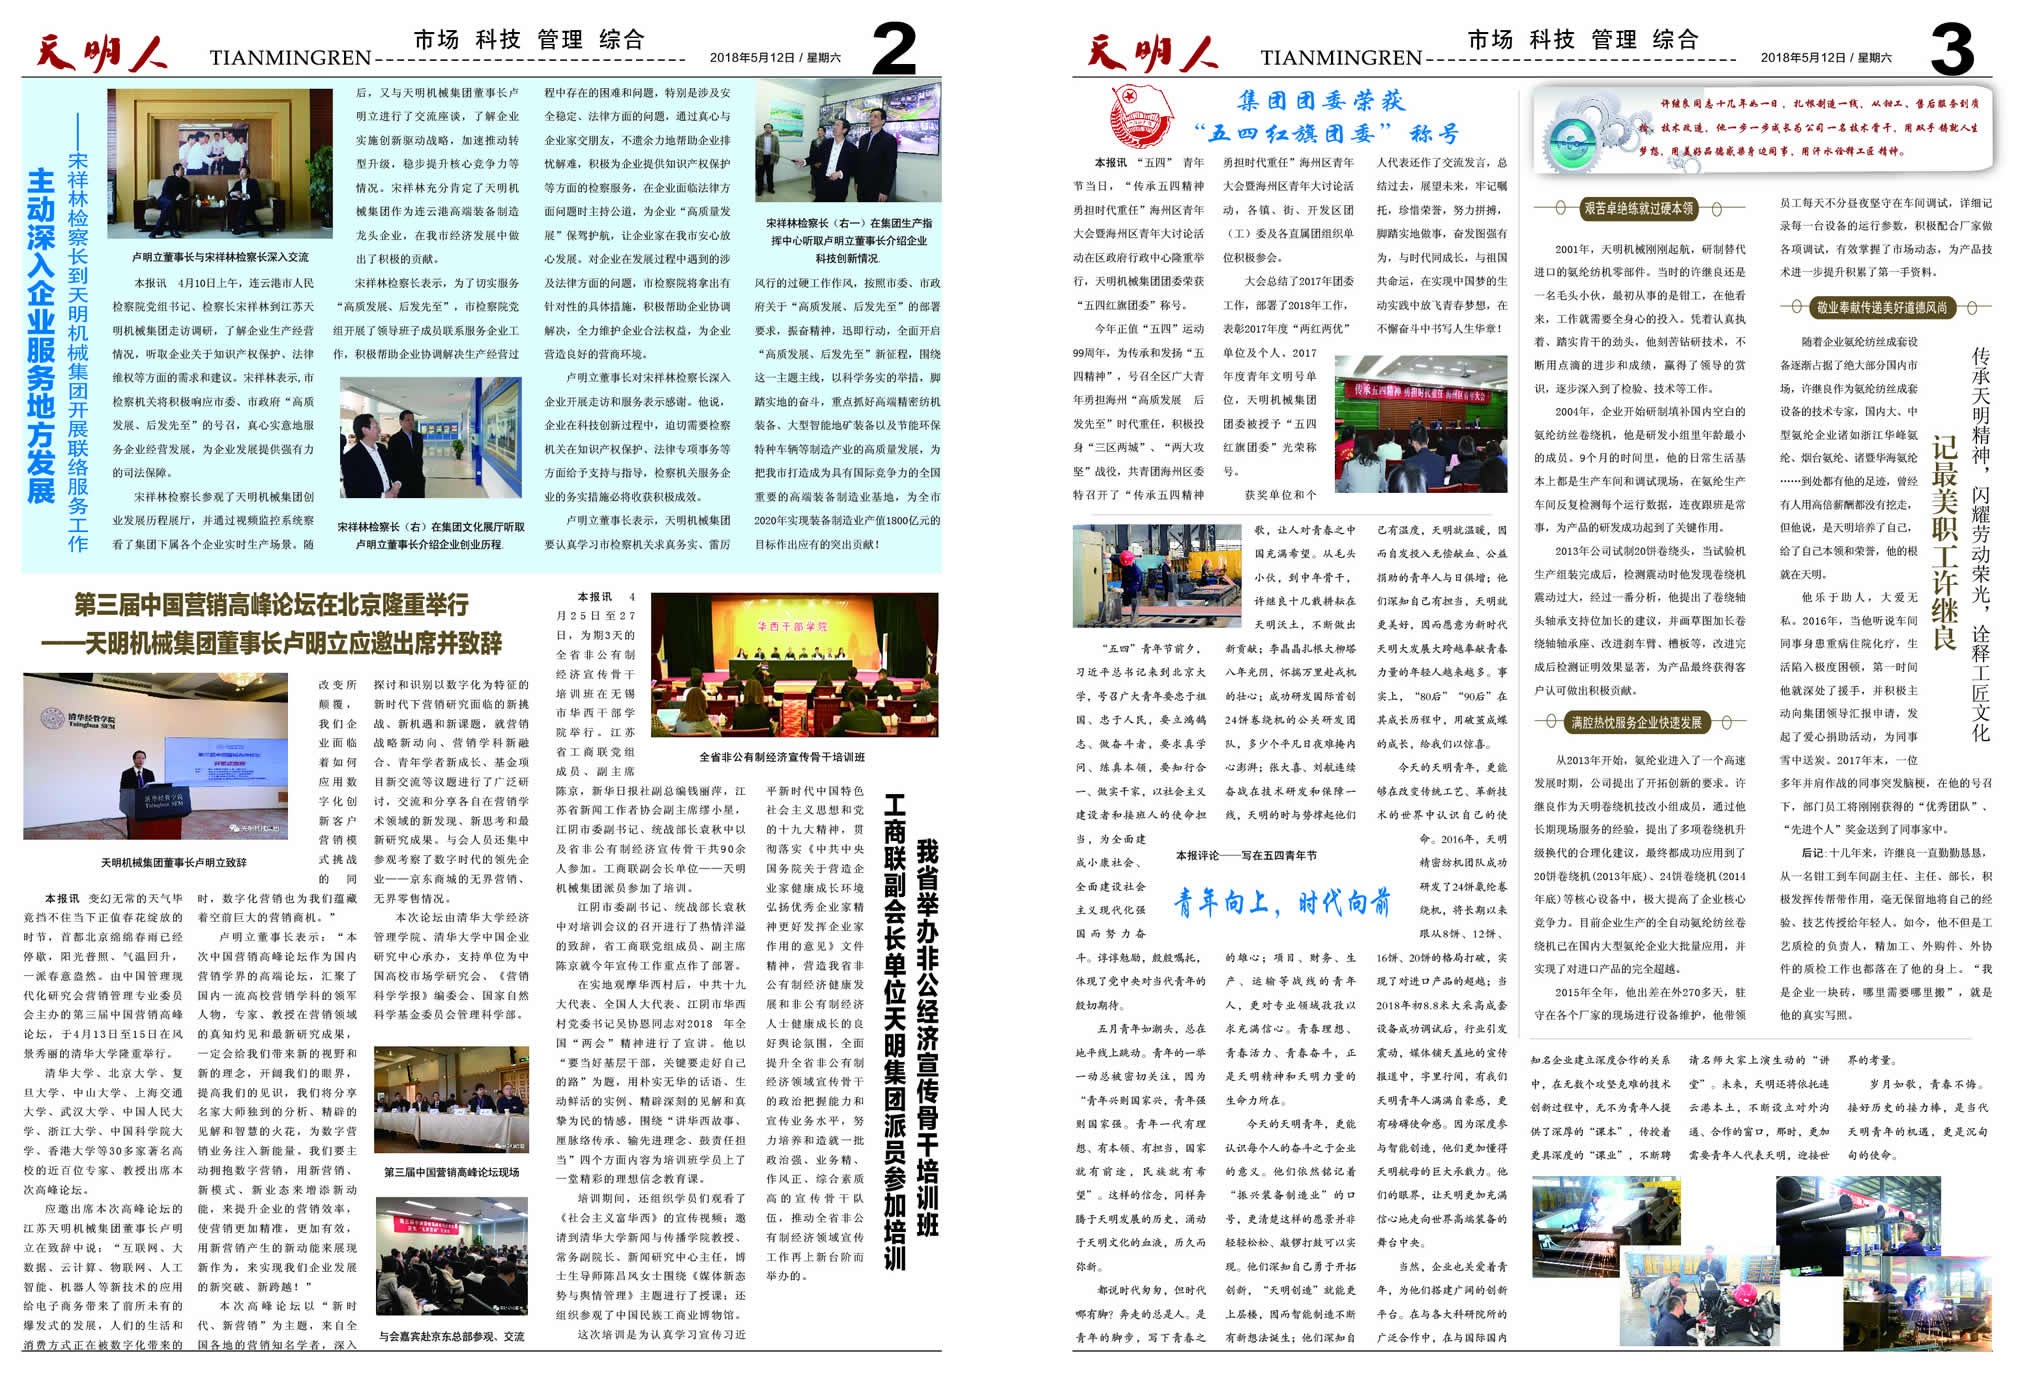 hg711皇冠国际_hg88皇冠国际平台_hg皇冠国际vip首页人2018年第三期(总第116期)2、3版